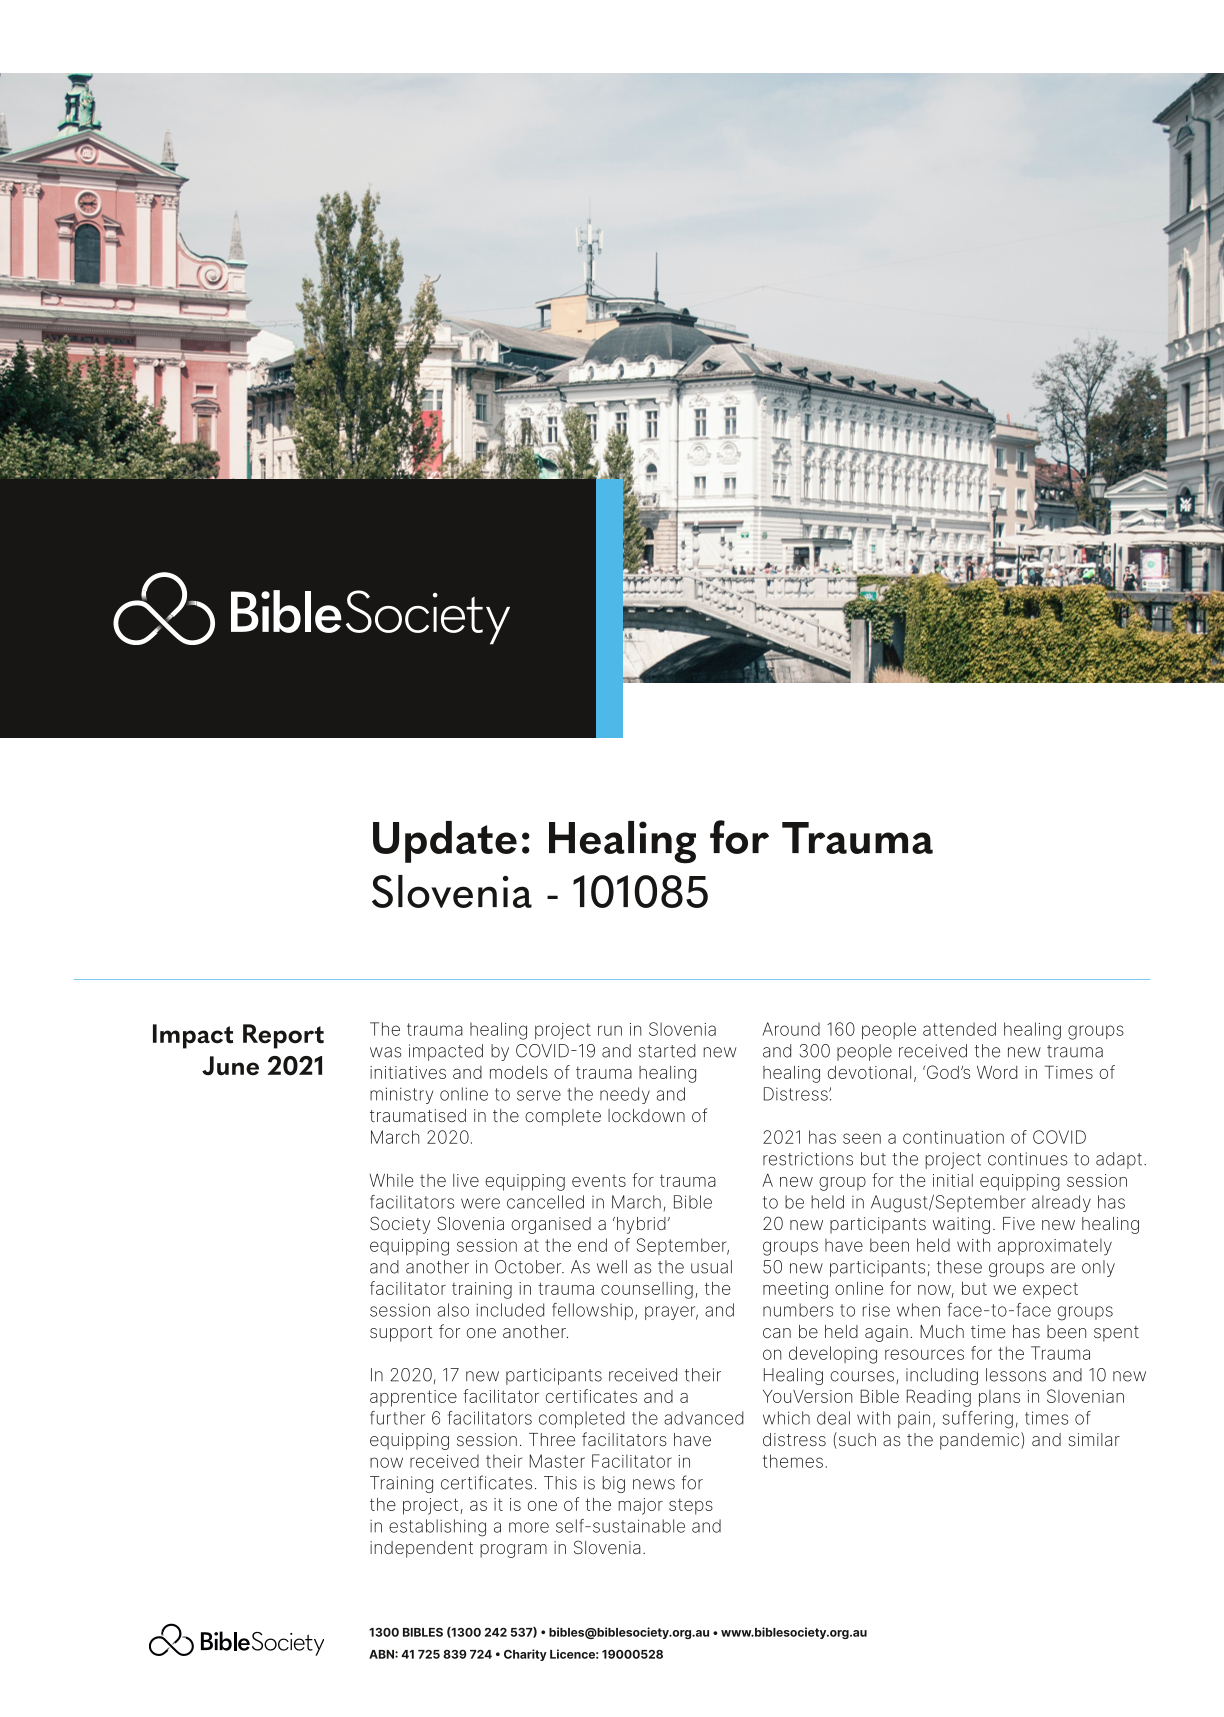 Slovenia Update: Healing for Trauma